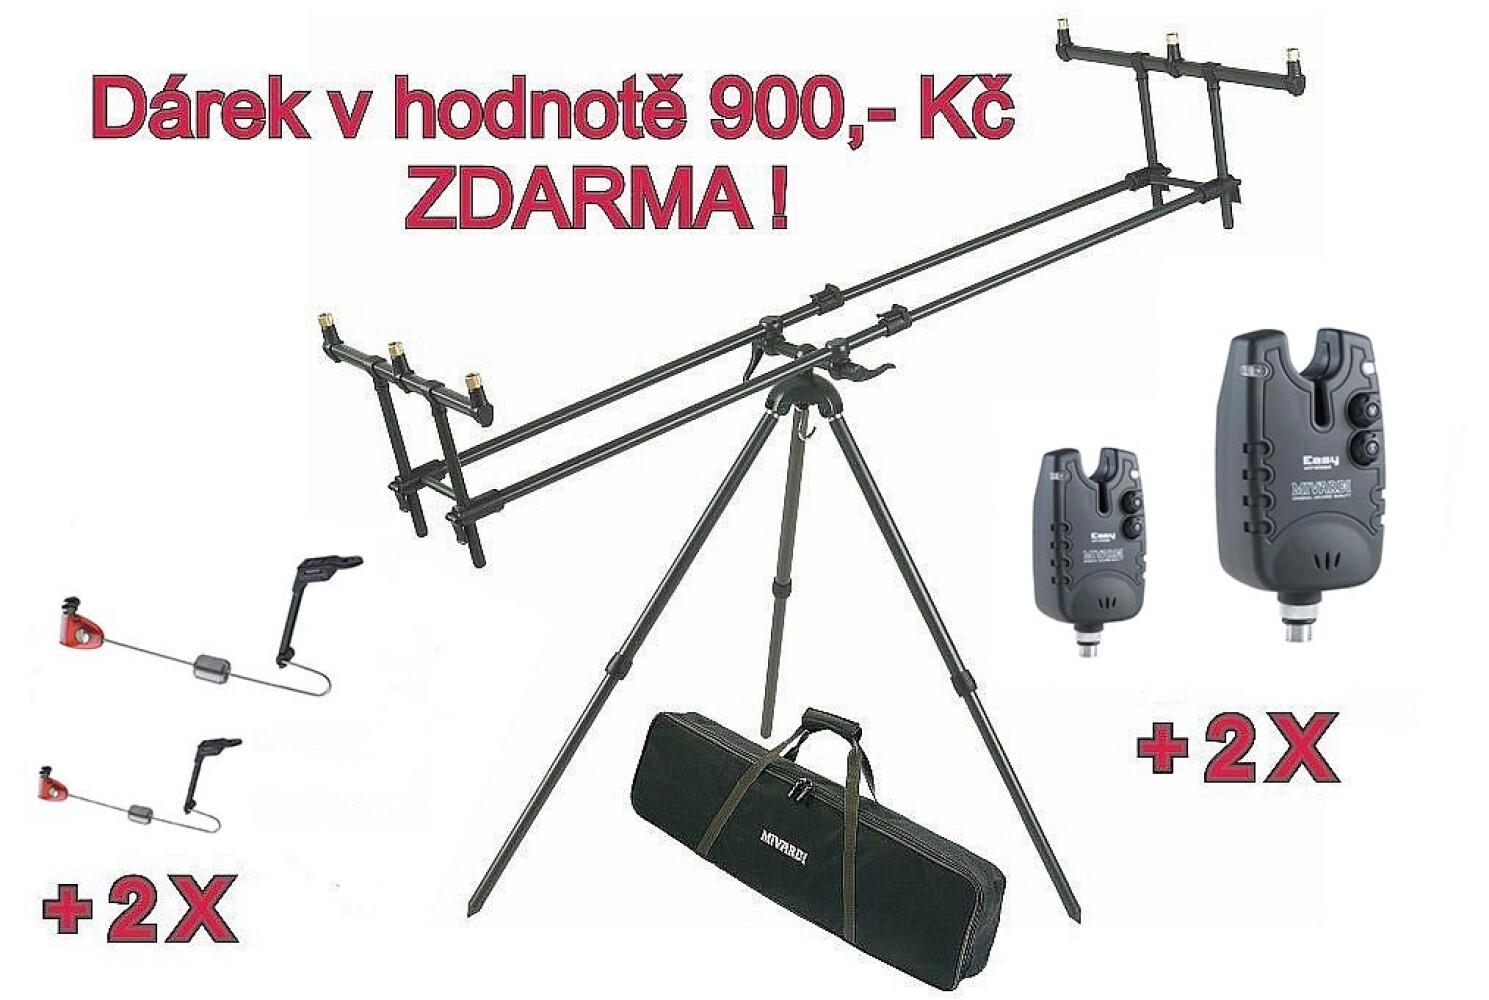 AKCE - Tripod Premium + ZDARMA 2 x Hlásič EASY blue & green a 2 x Swing Arm no.130 blue & green